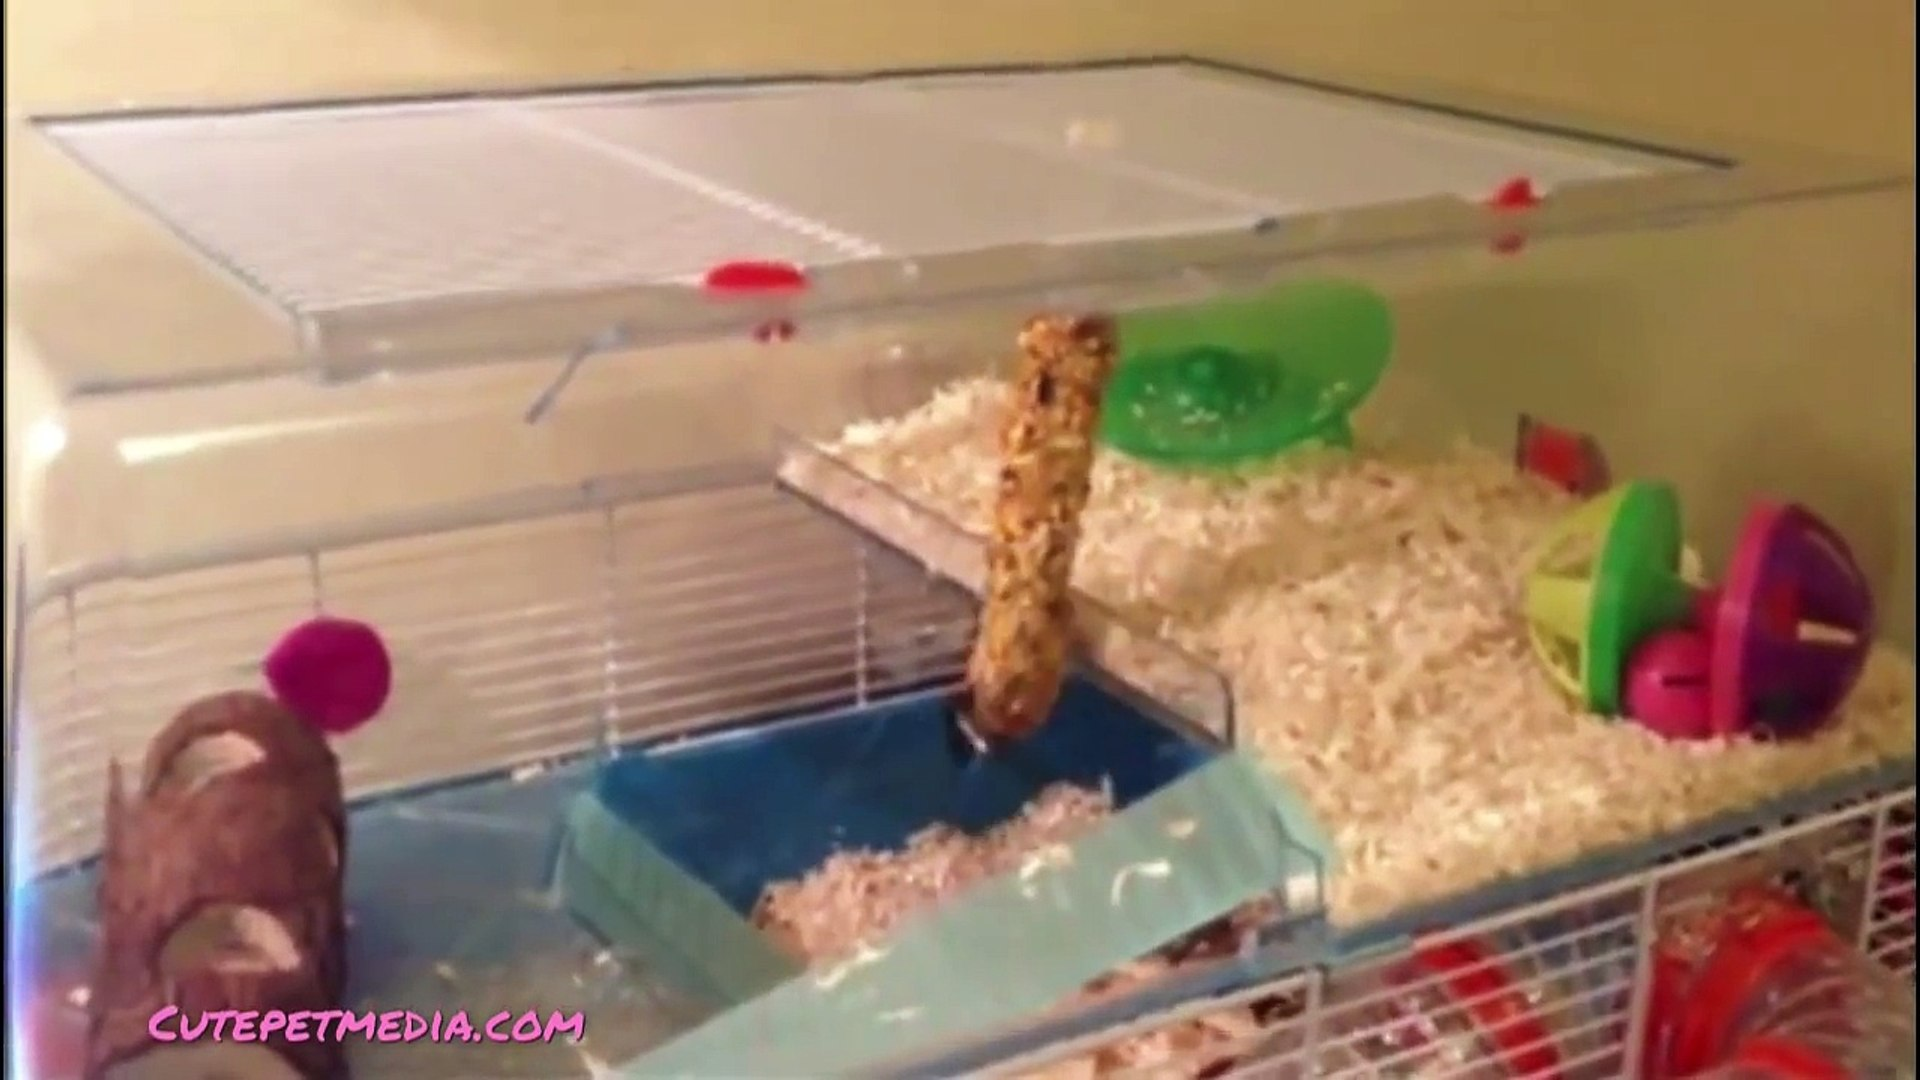 ANIMAL FAILS ?? FUNNY PET Fails Compilation [Funny Pets]